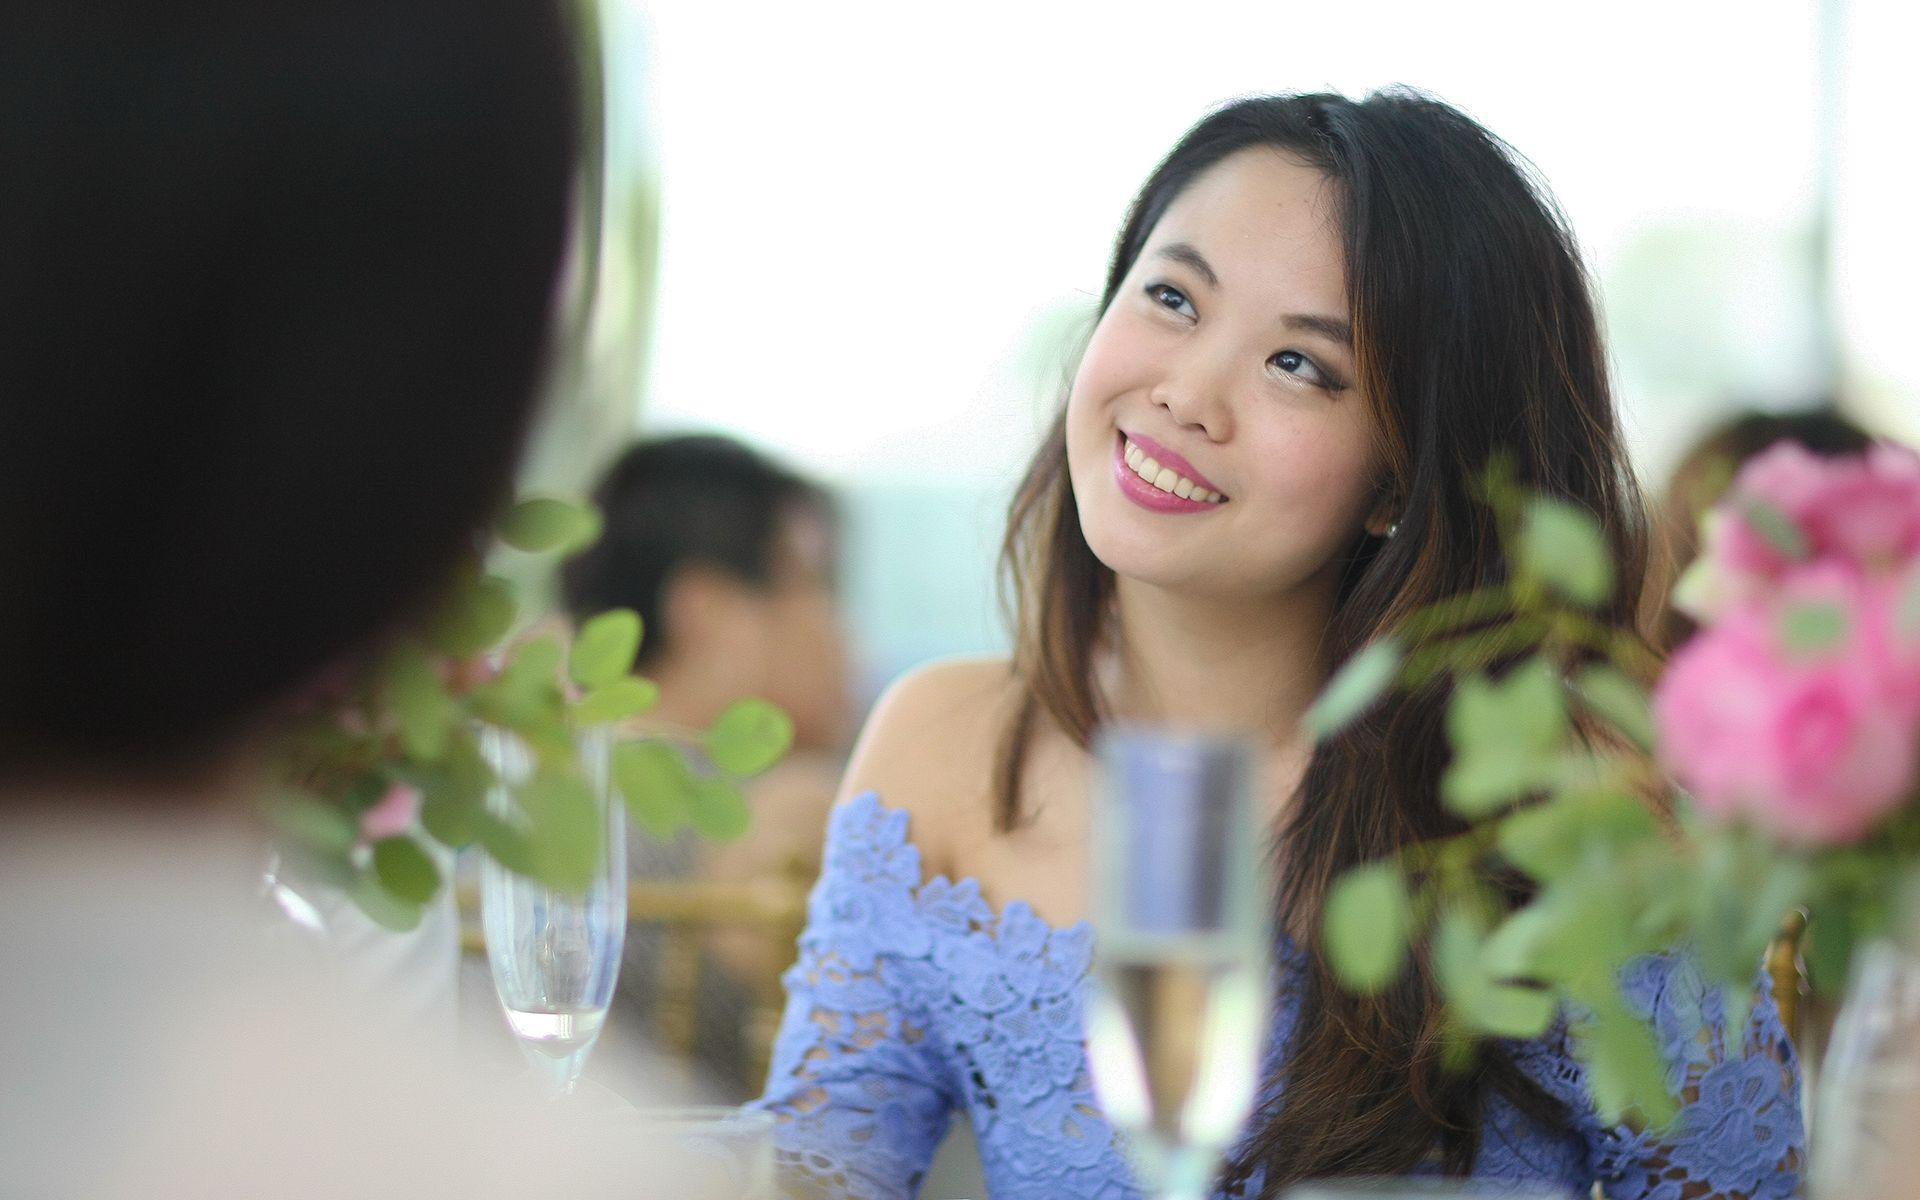 Yap Po Leen